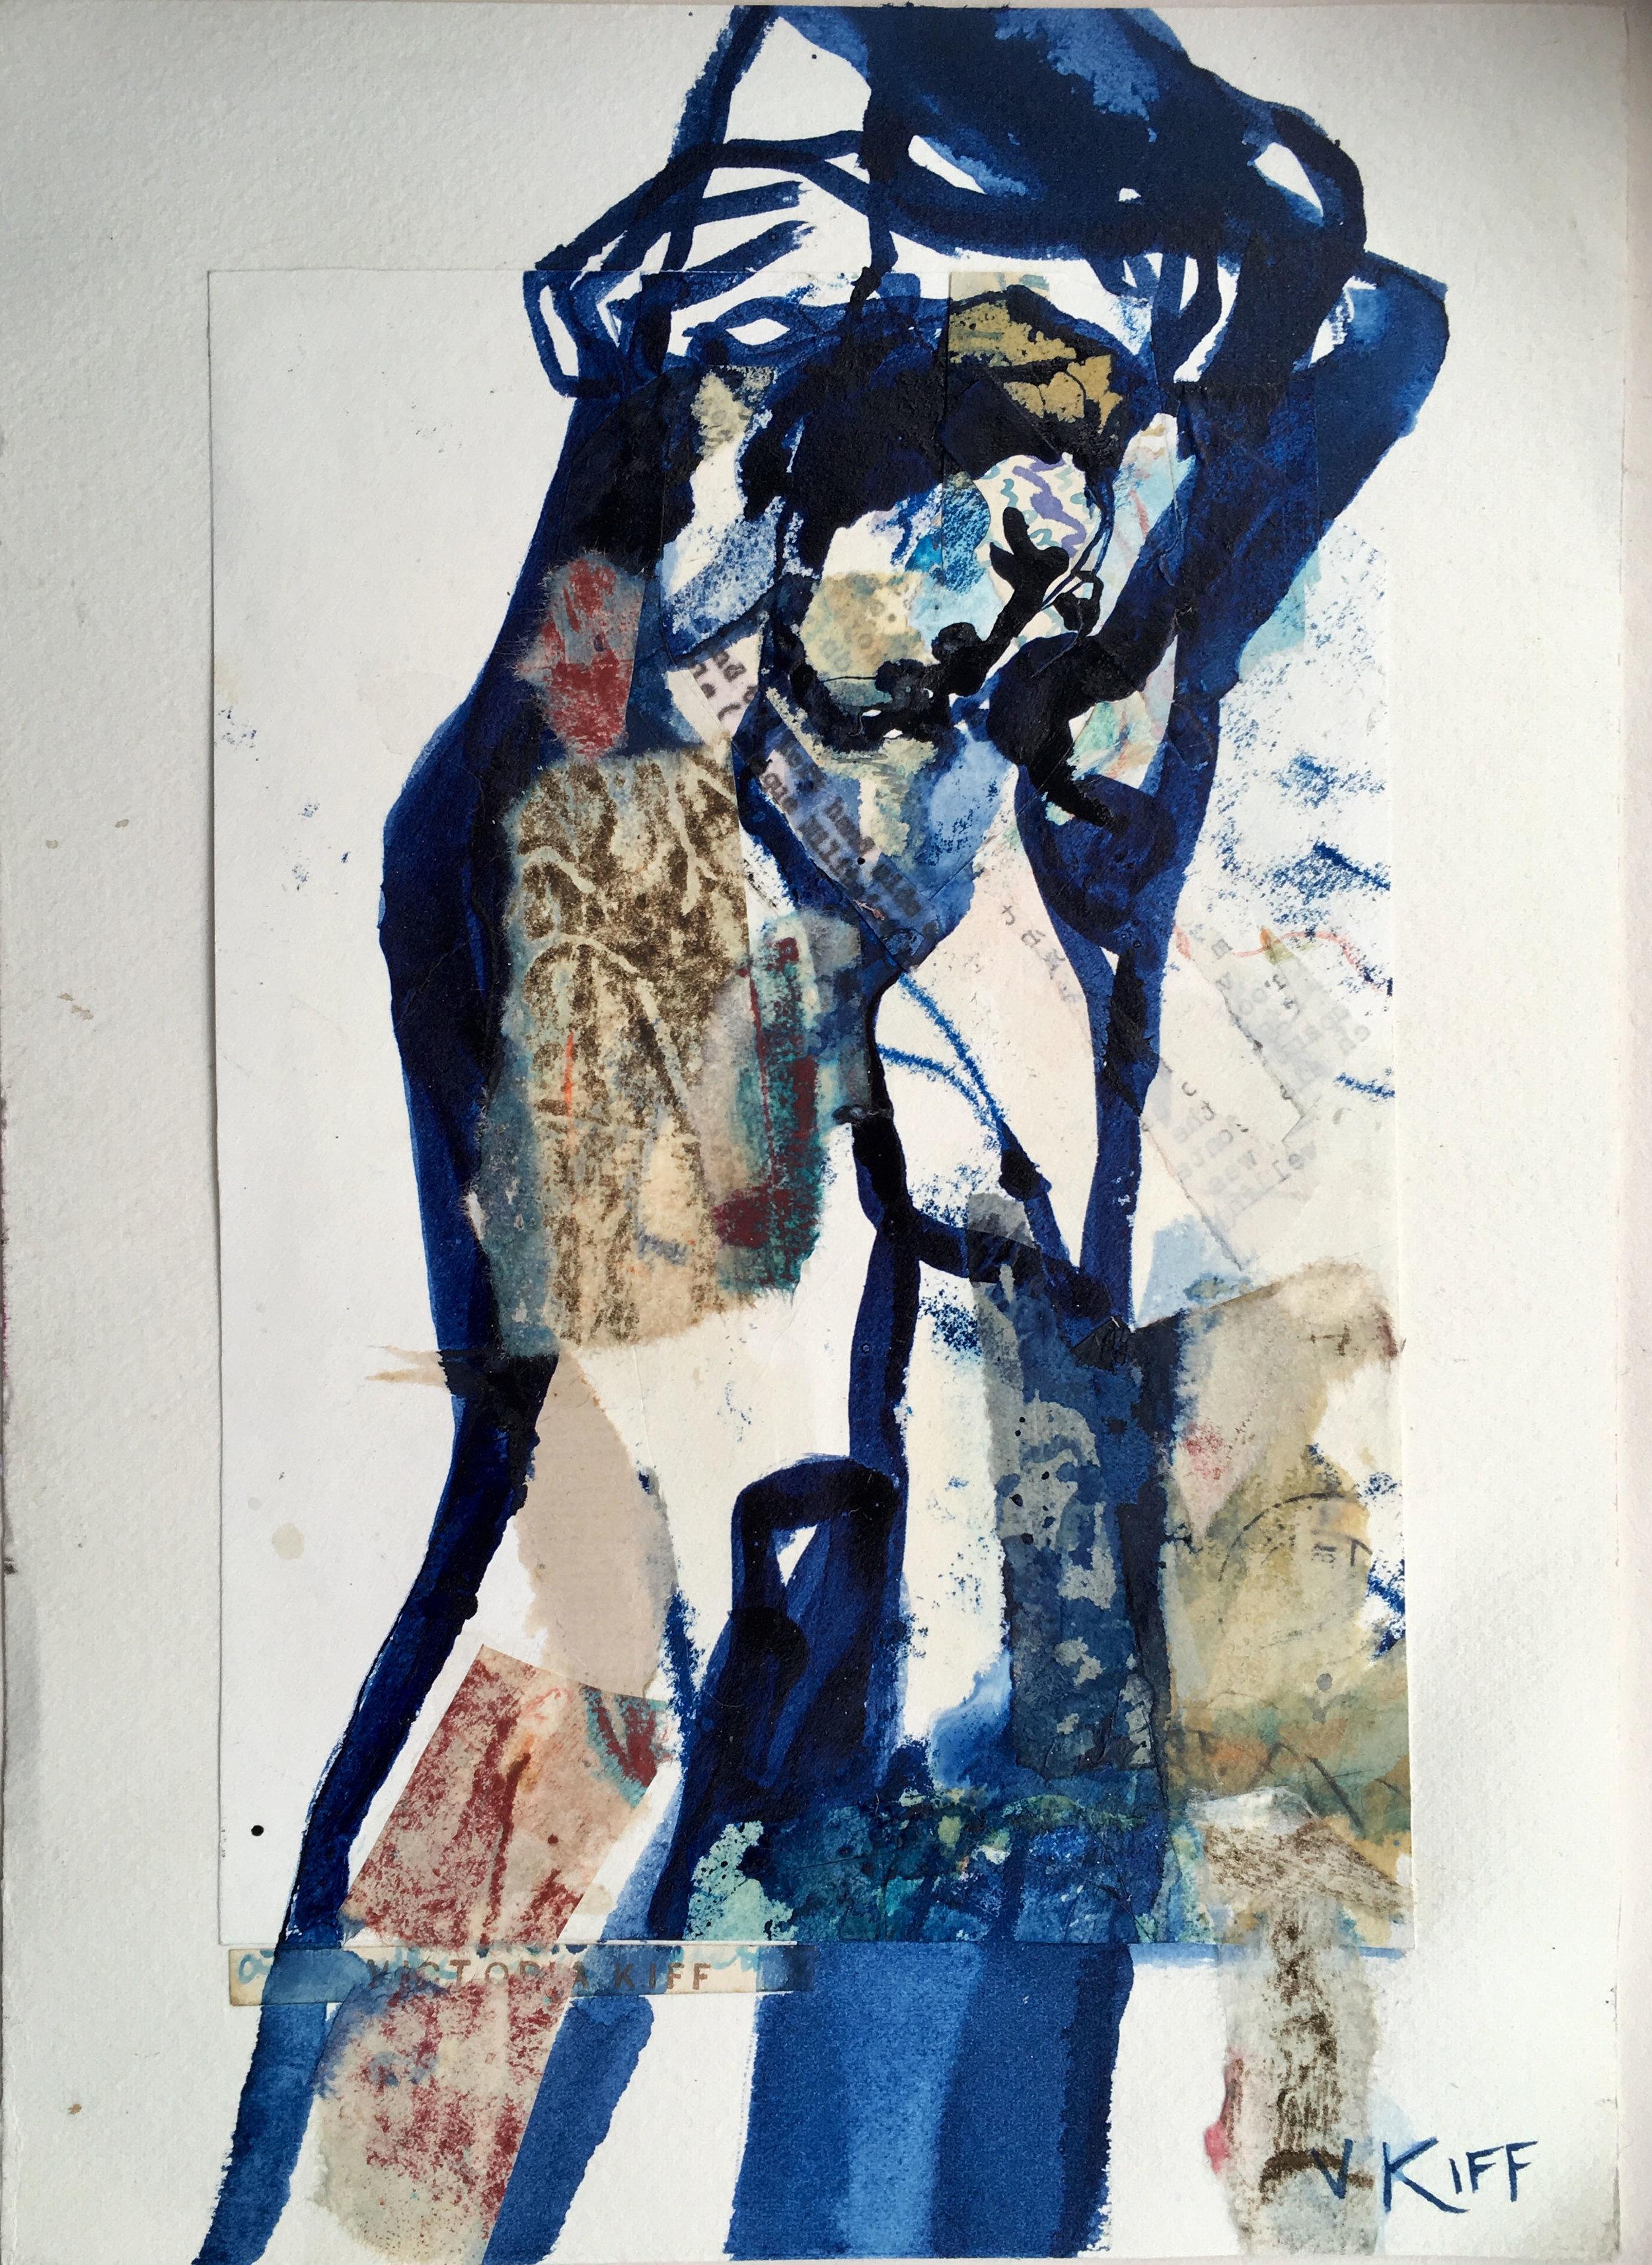 Artist: Victoria Kiff  Title: A Bottle in the Sea  Size: 35 x 50cm  Medium: ink on cotton rag  Price: £550